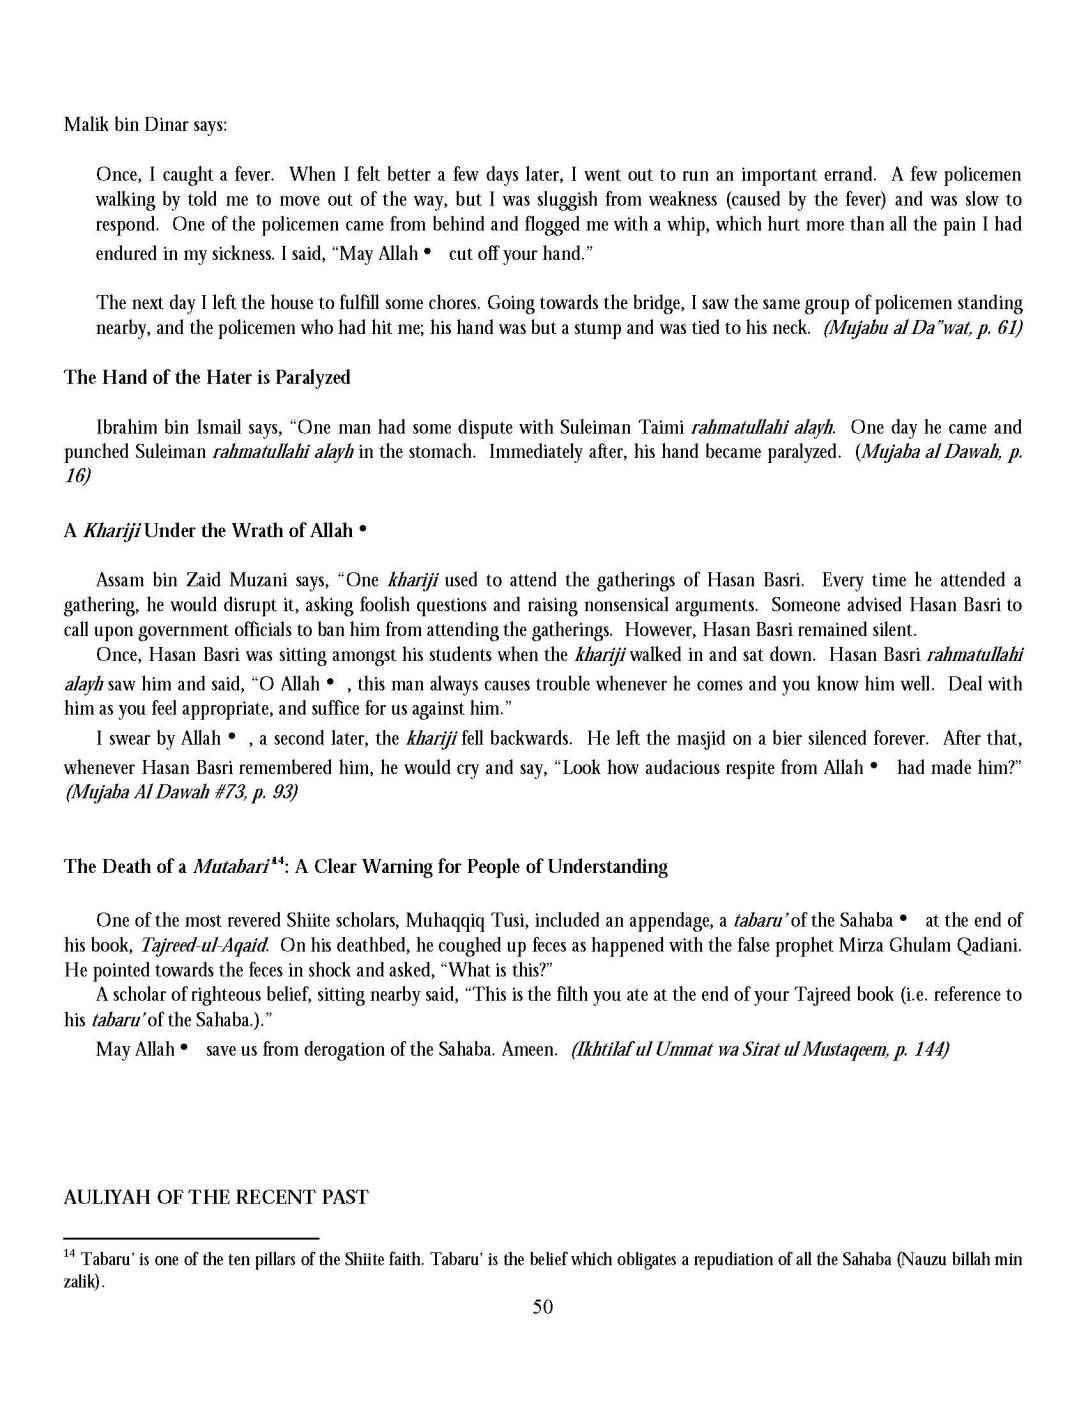 ConsequencesOfDebasingAuliyaAllah_Page_51